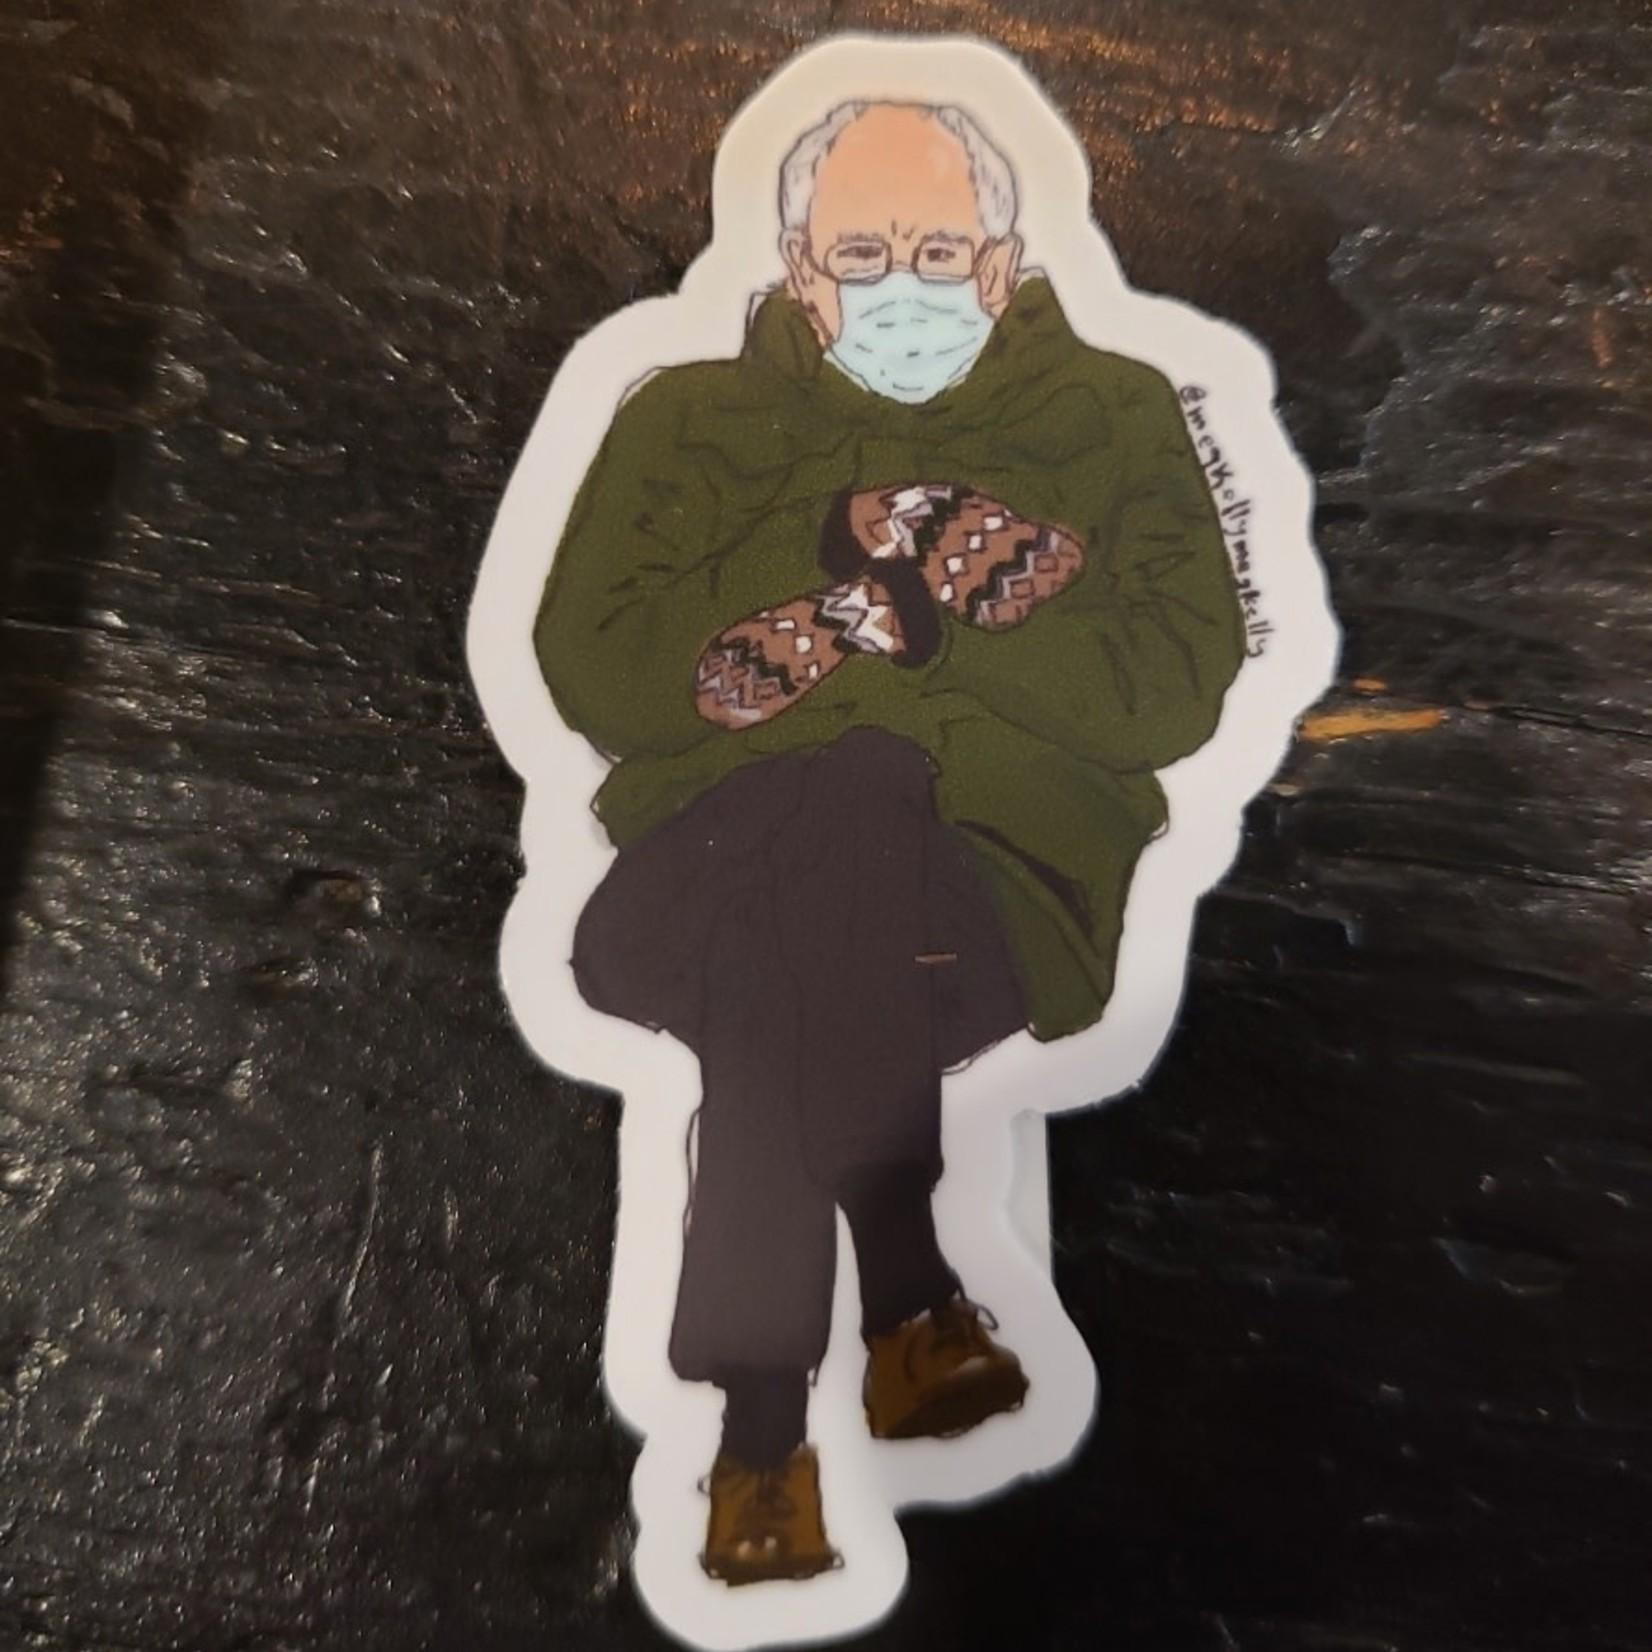 Meg Kelly Meg Kelly Sticker Bernie Sanders